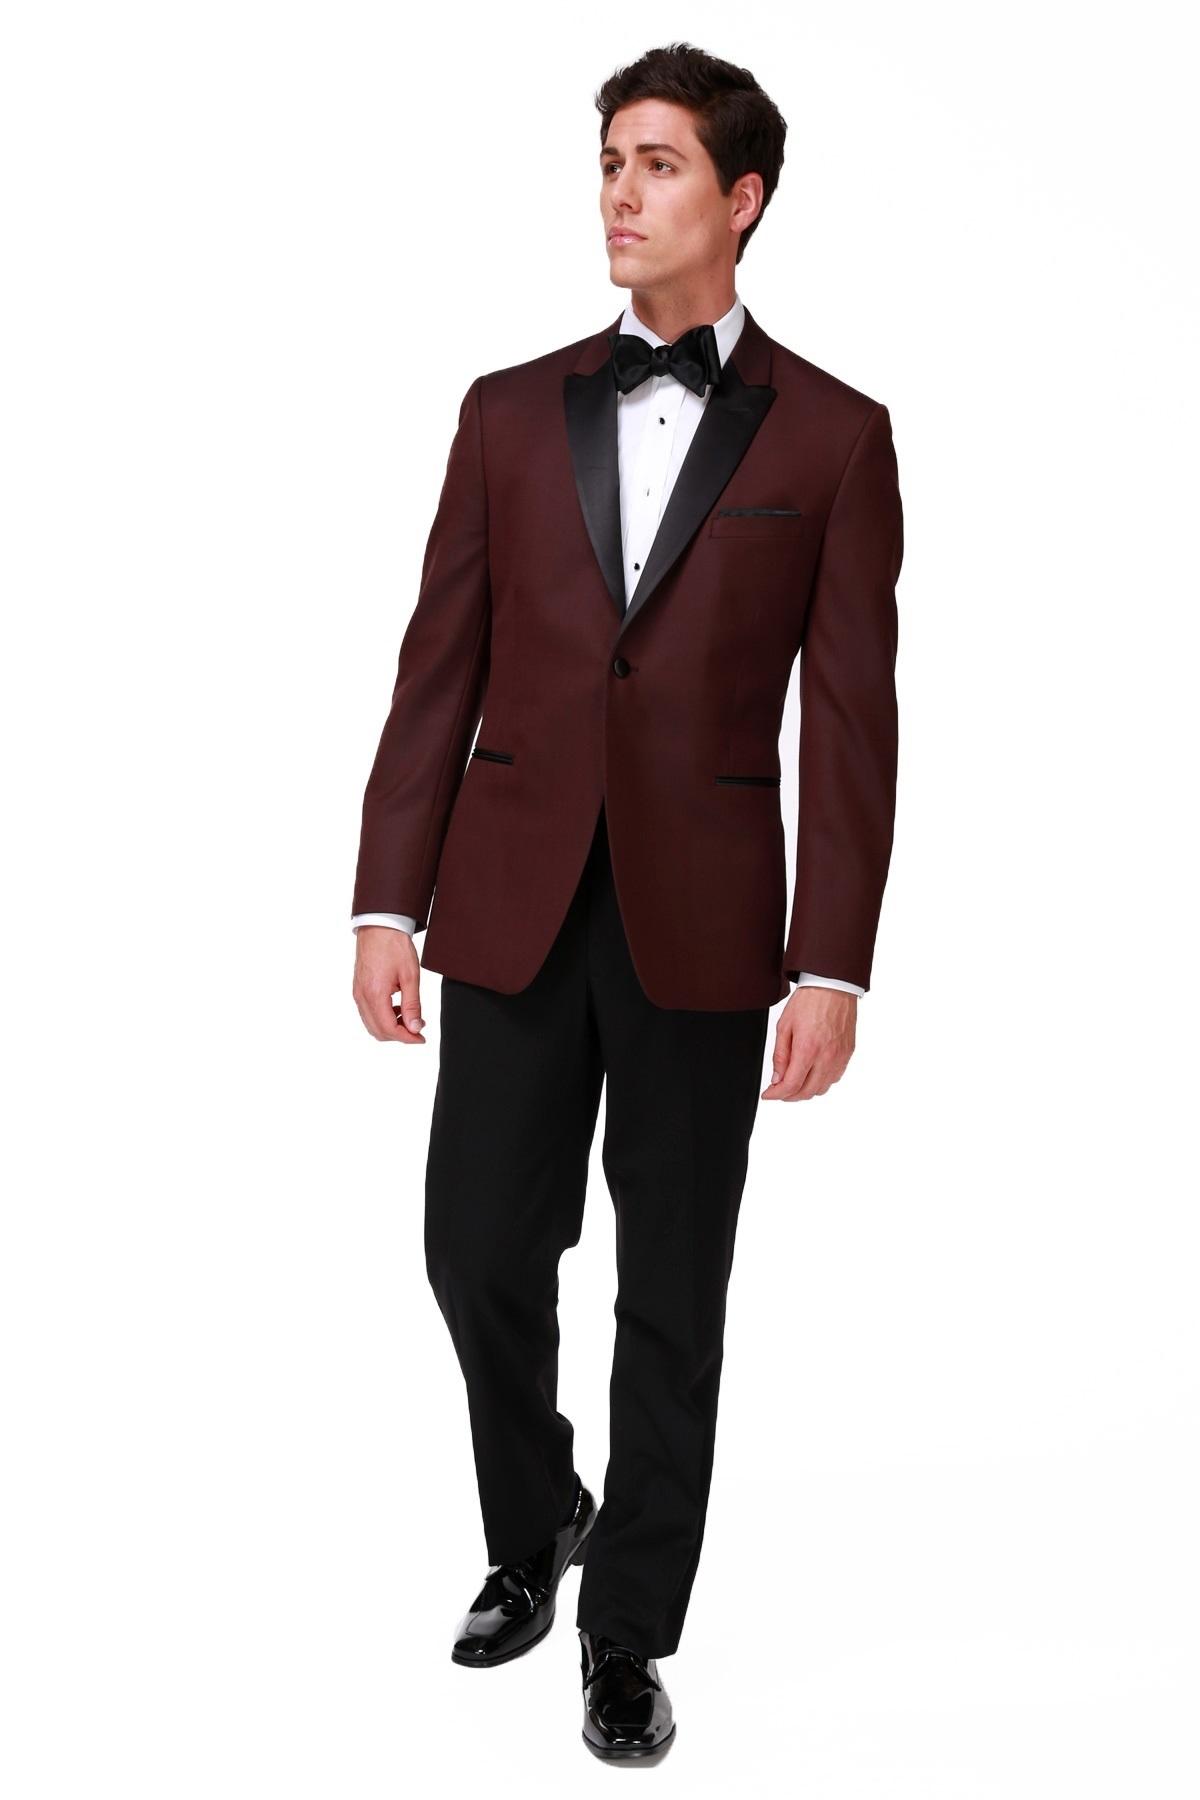 Milroy S Tuxedos Burgundy Ike Behar Marbella Tuxedo